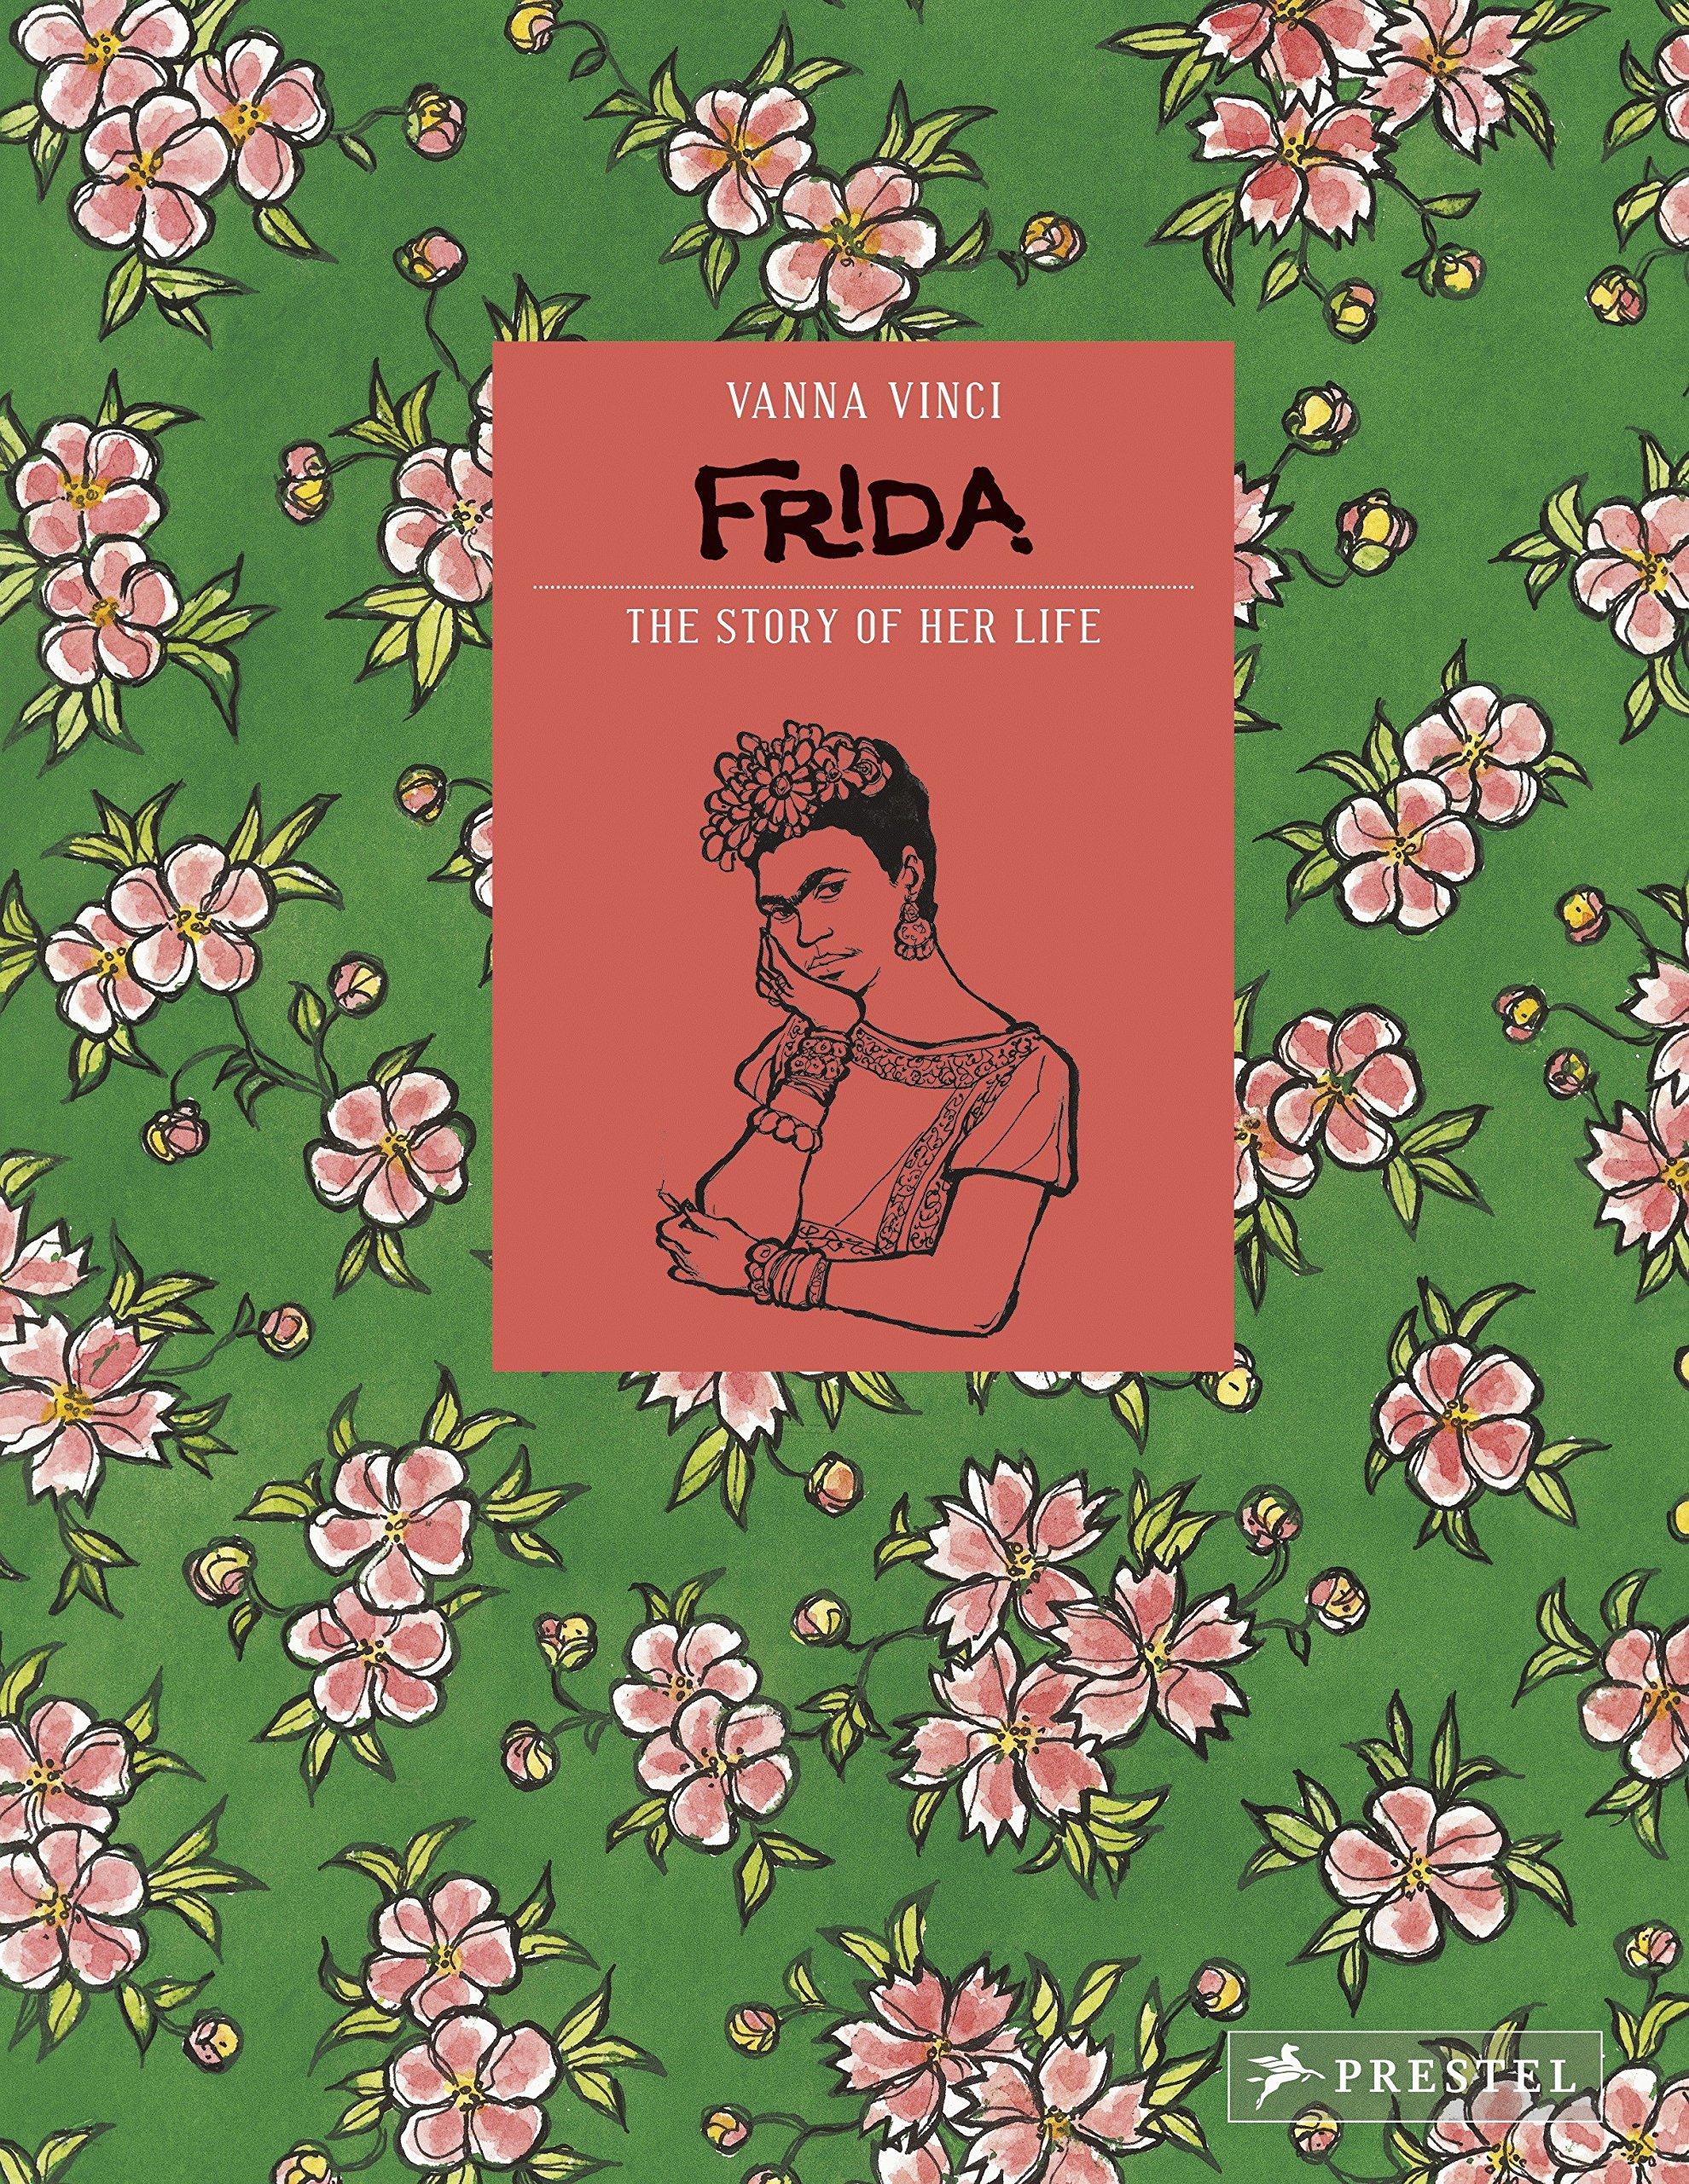 Frida Kahlo: The Story of Her Life: Amazon co uk: Vanna Vinci